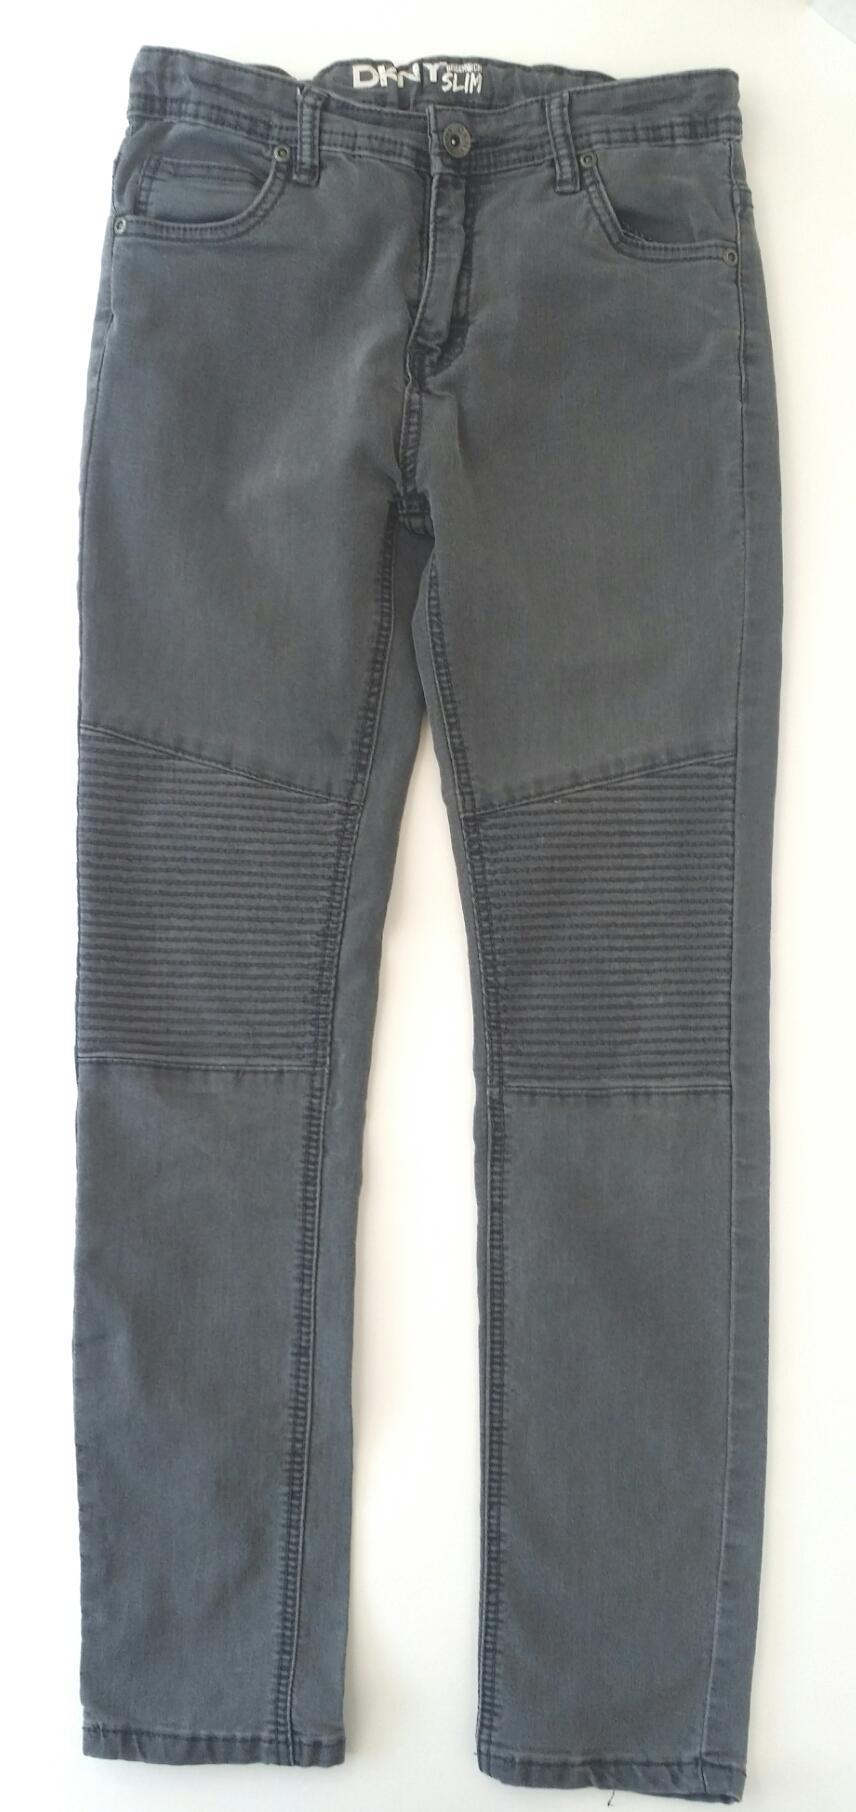 DKNY-12-YEARS-Jeans_2157044A.jpg